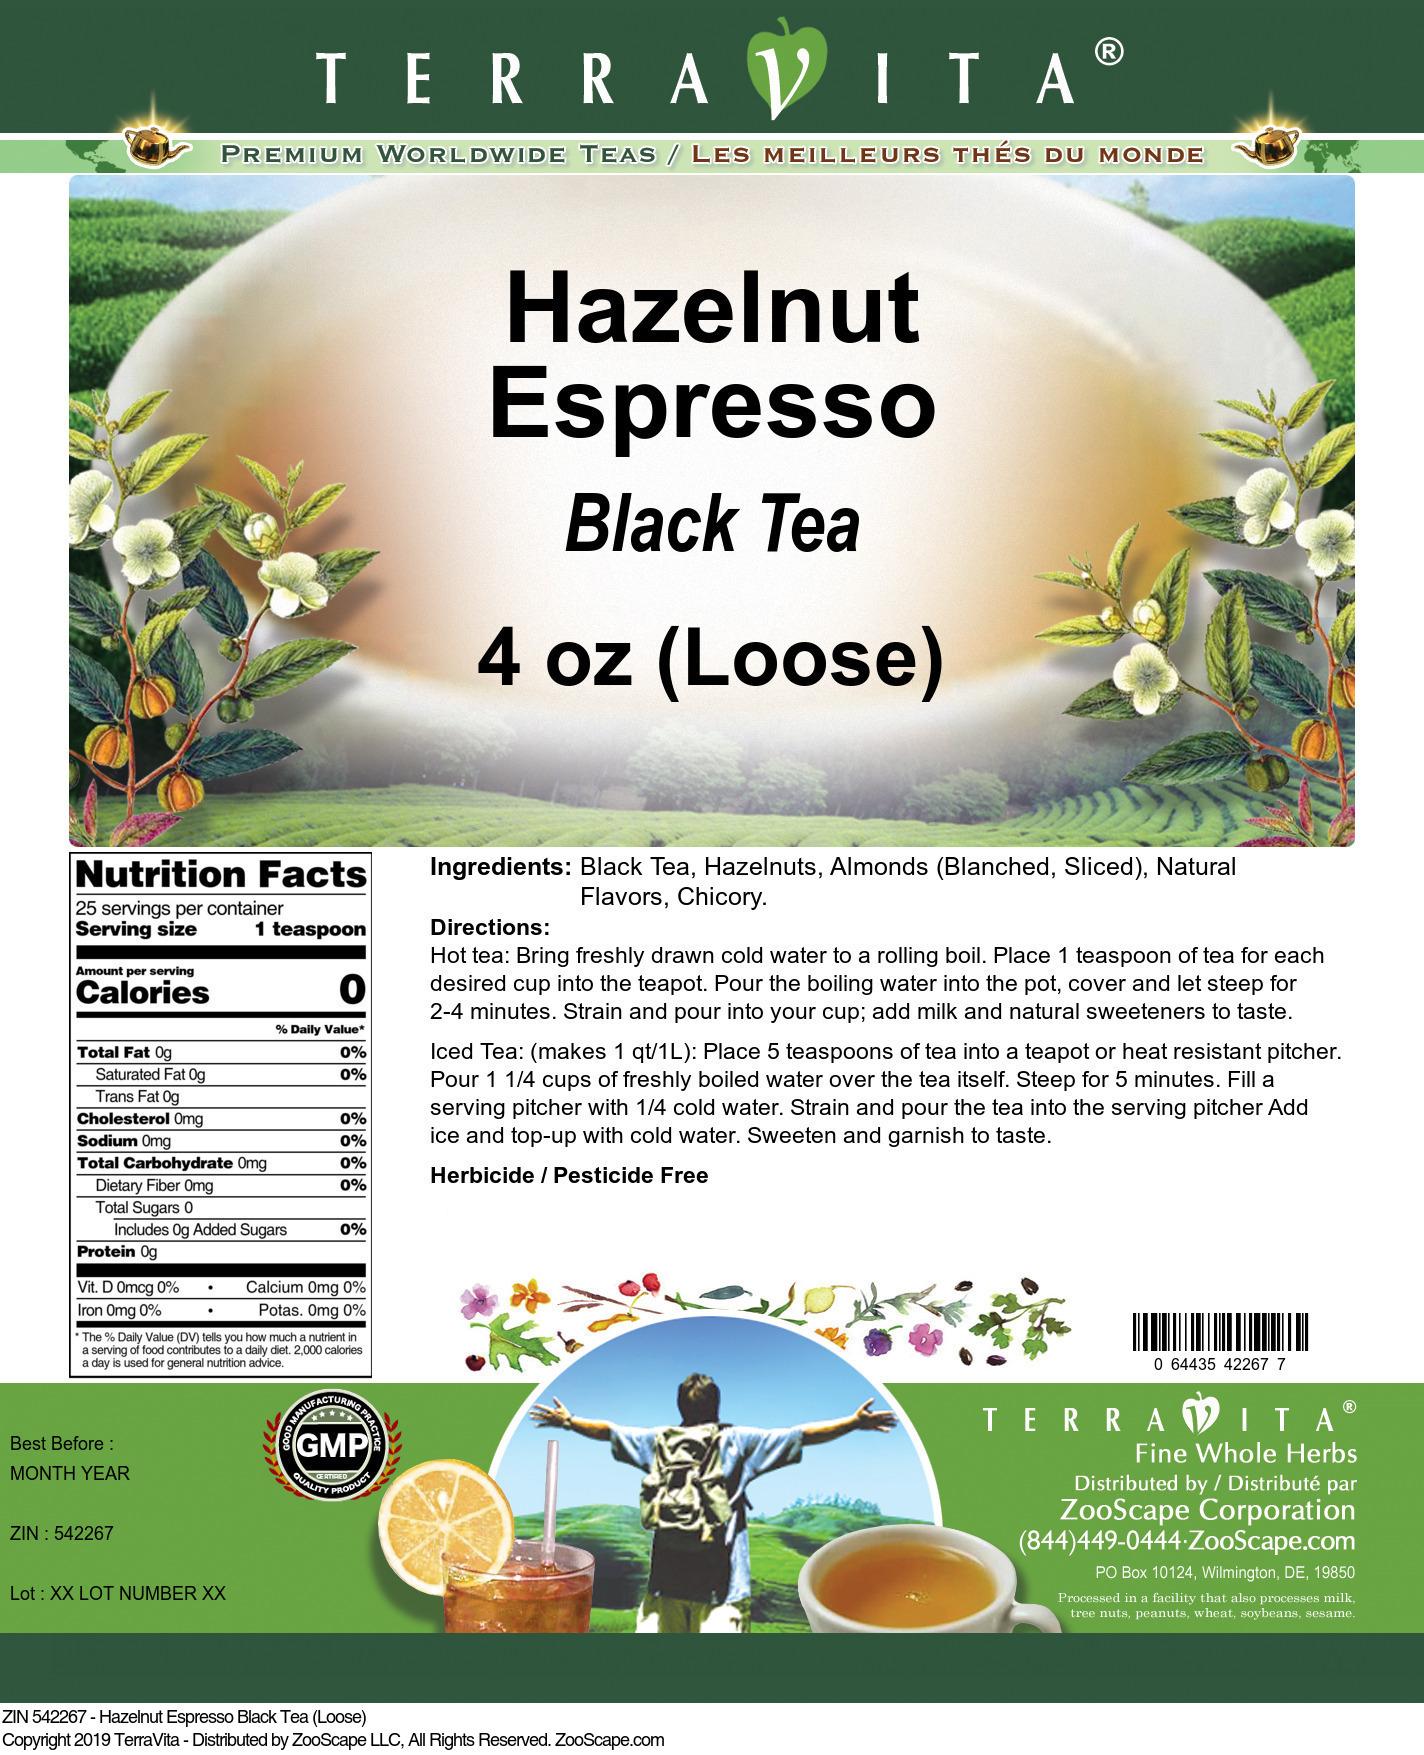 Hazelnut Espresso Black Tea